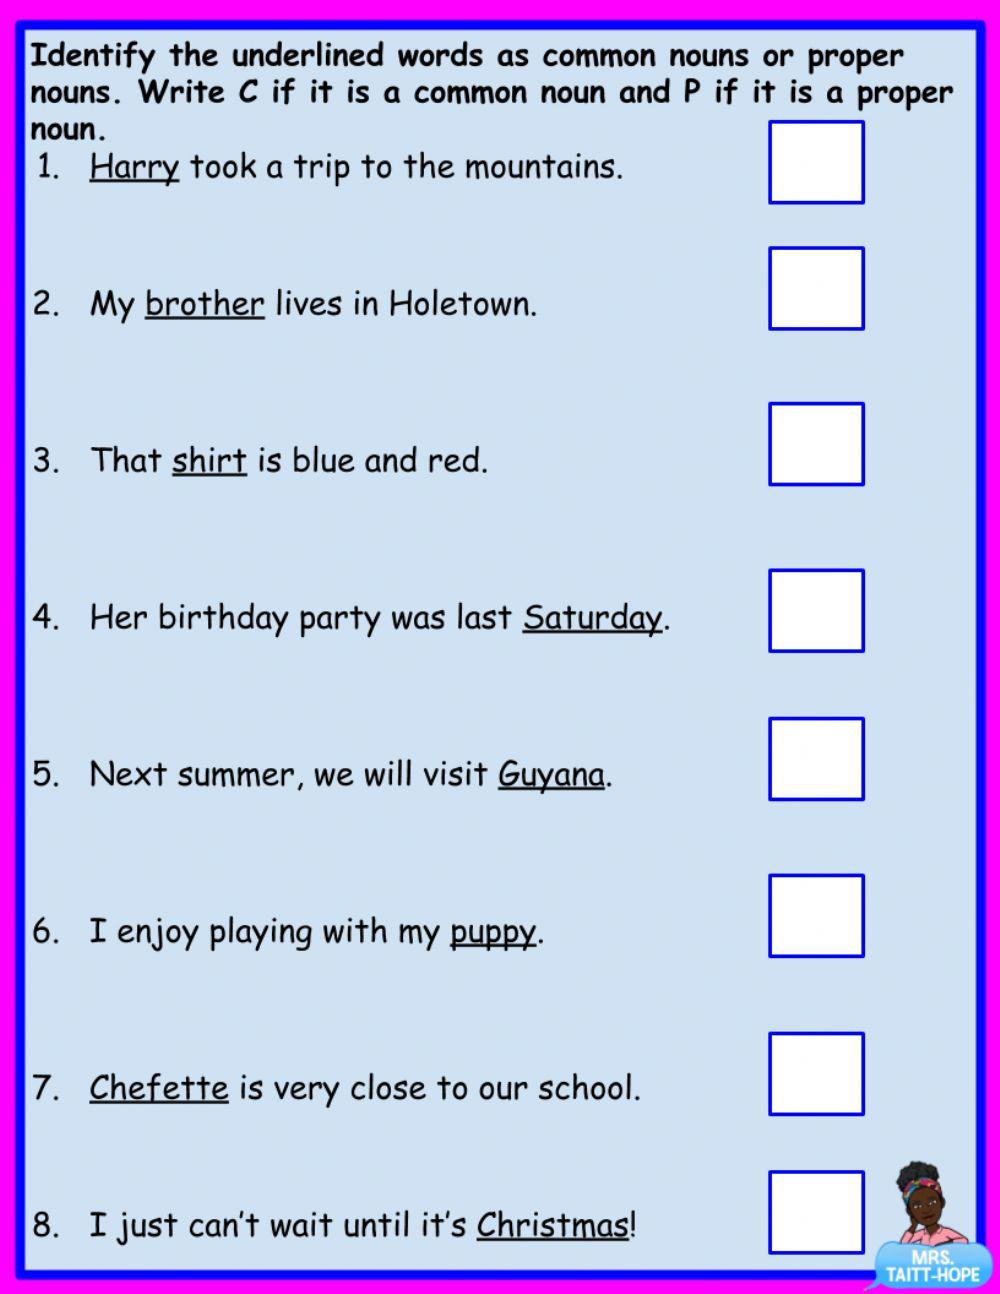 Proper Nouns Worksheet 2nd Grade Distinguishing Mon From Proper Nouns Interactive Worksheet